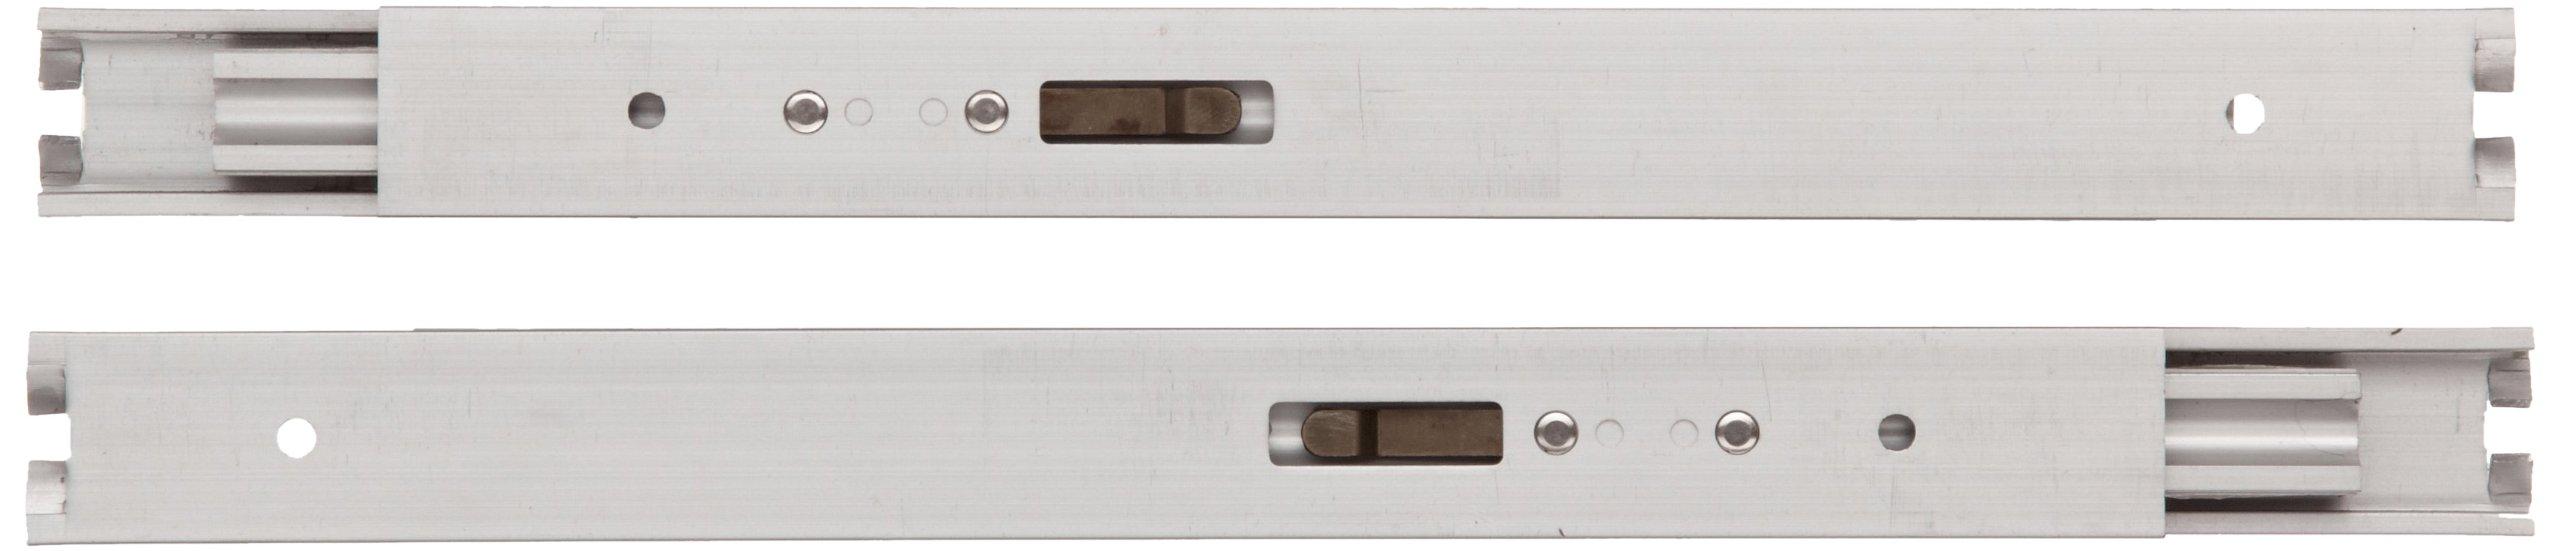 Sugastune AR3-K Aluminum Drawer Slide, Full Extension, Positive Stop, 15-3/4'' Closed, 16-19/64'' Travel, 29 lbs/Pack Ld Cap (1 Pair)